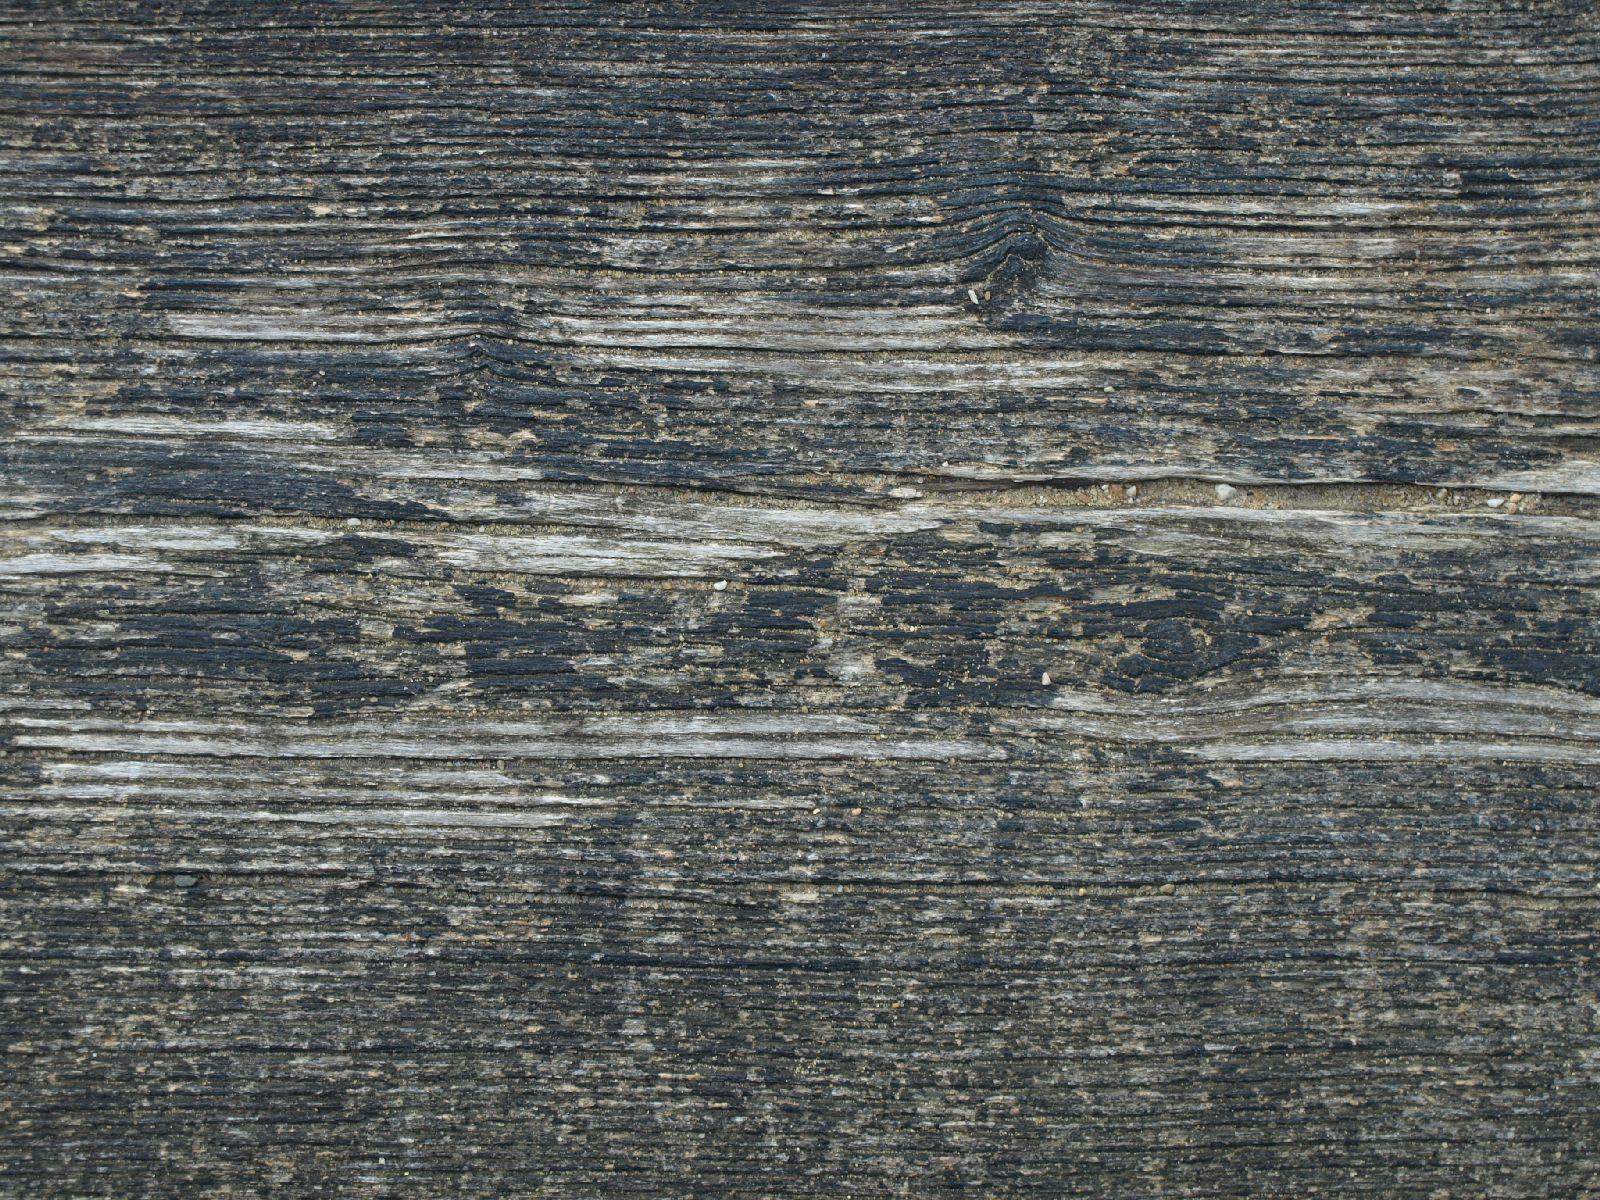 Wood_Texture_A_P8154265